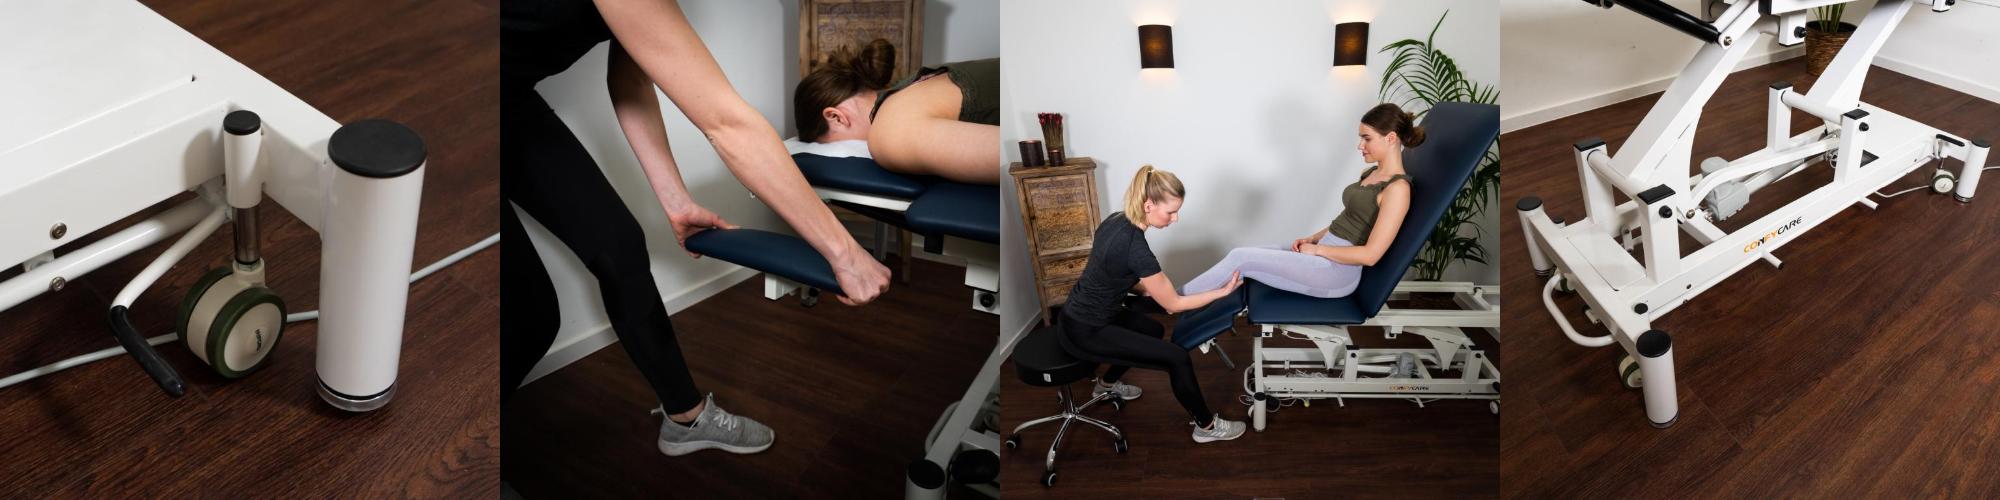 Physiotherapeut_Blog_Bild3